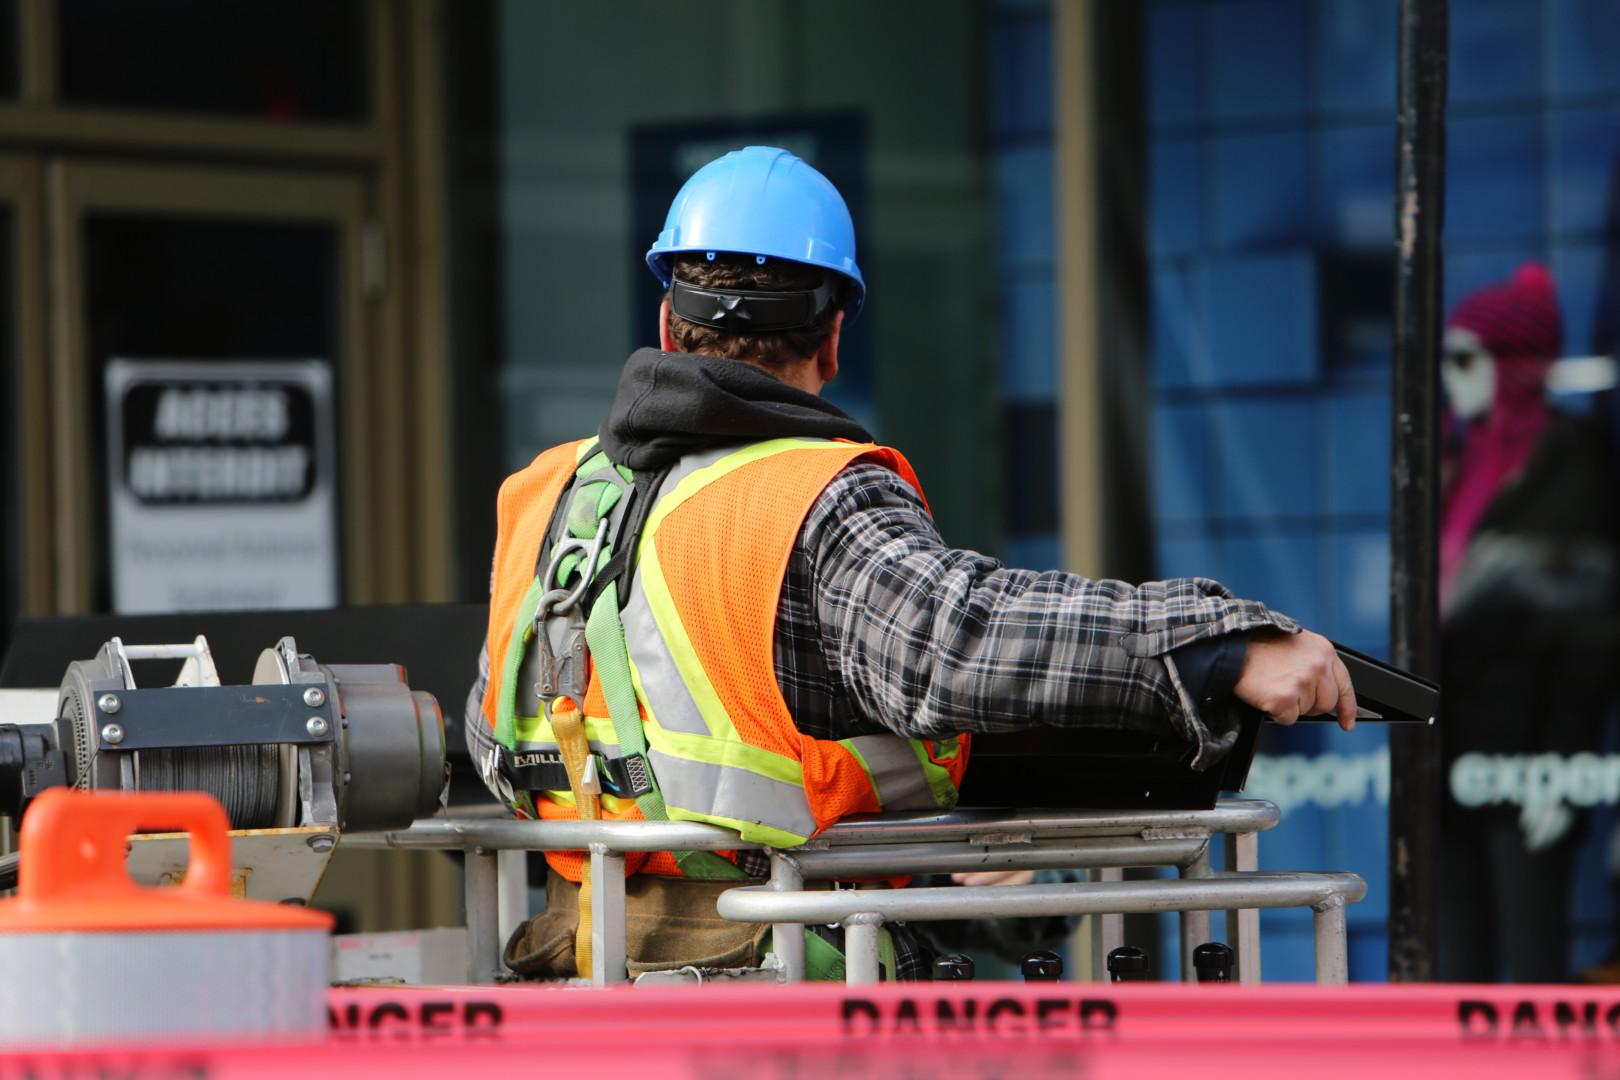 jobs-construction-ireland